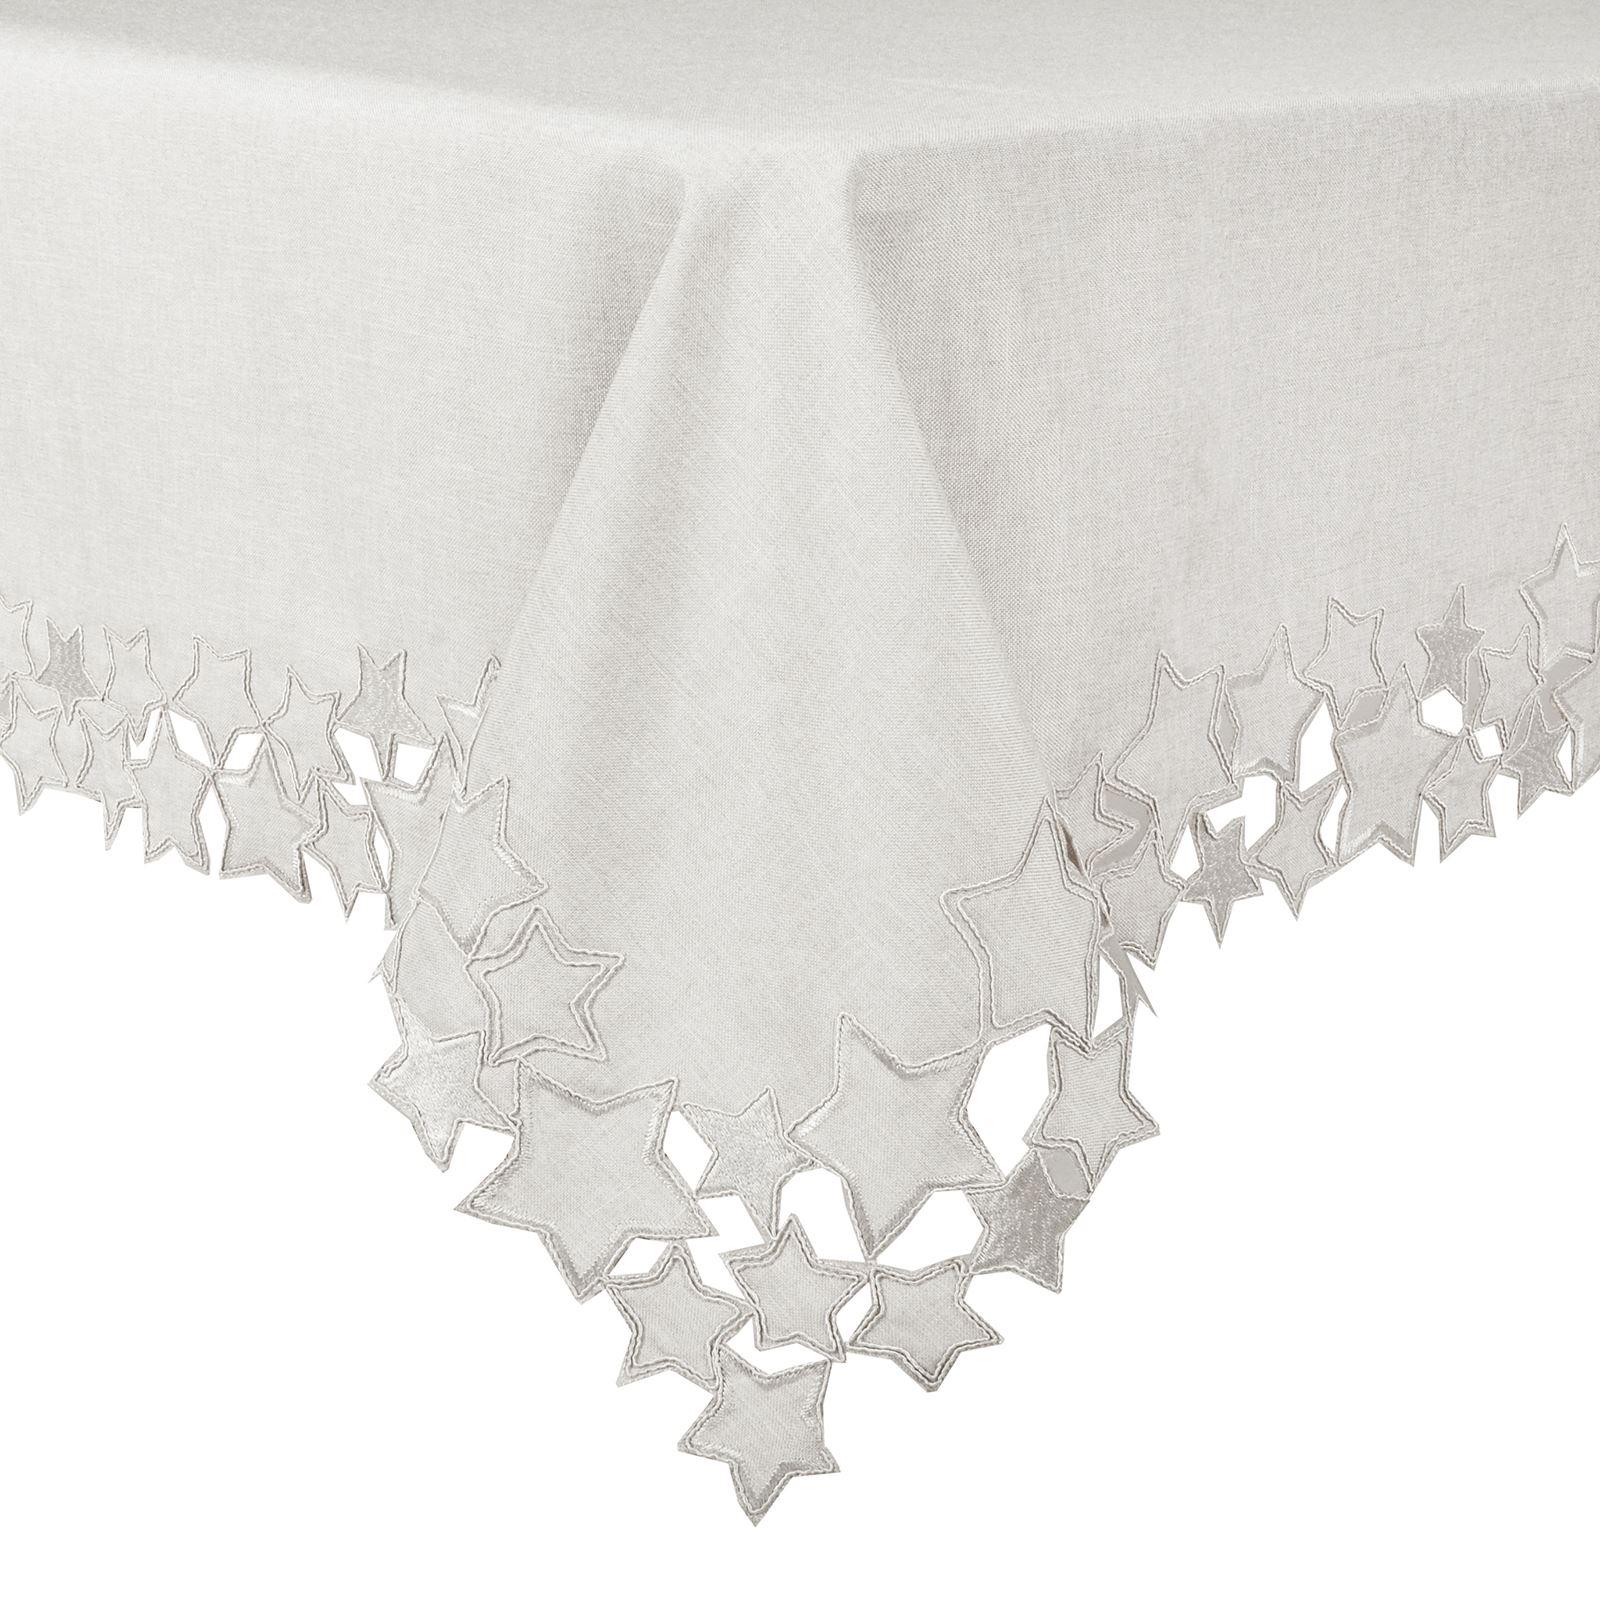 Christmas-Tablecloth-Festive-Pattern-Rectangle-Round-Fabric-Xmas-Room-Decoration Indexbild 135